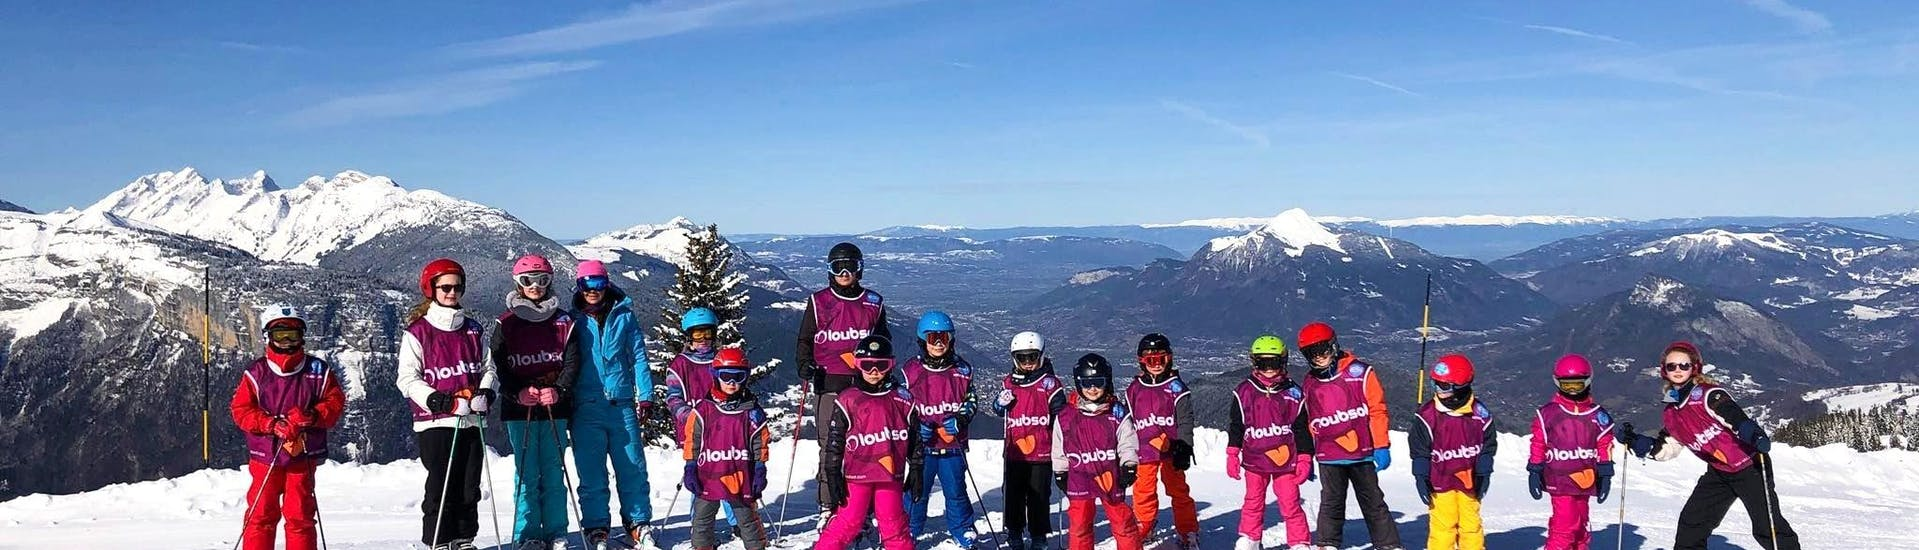 kids-ski-lessons-afternoon-flaine-esi-grand-massif